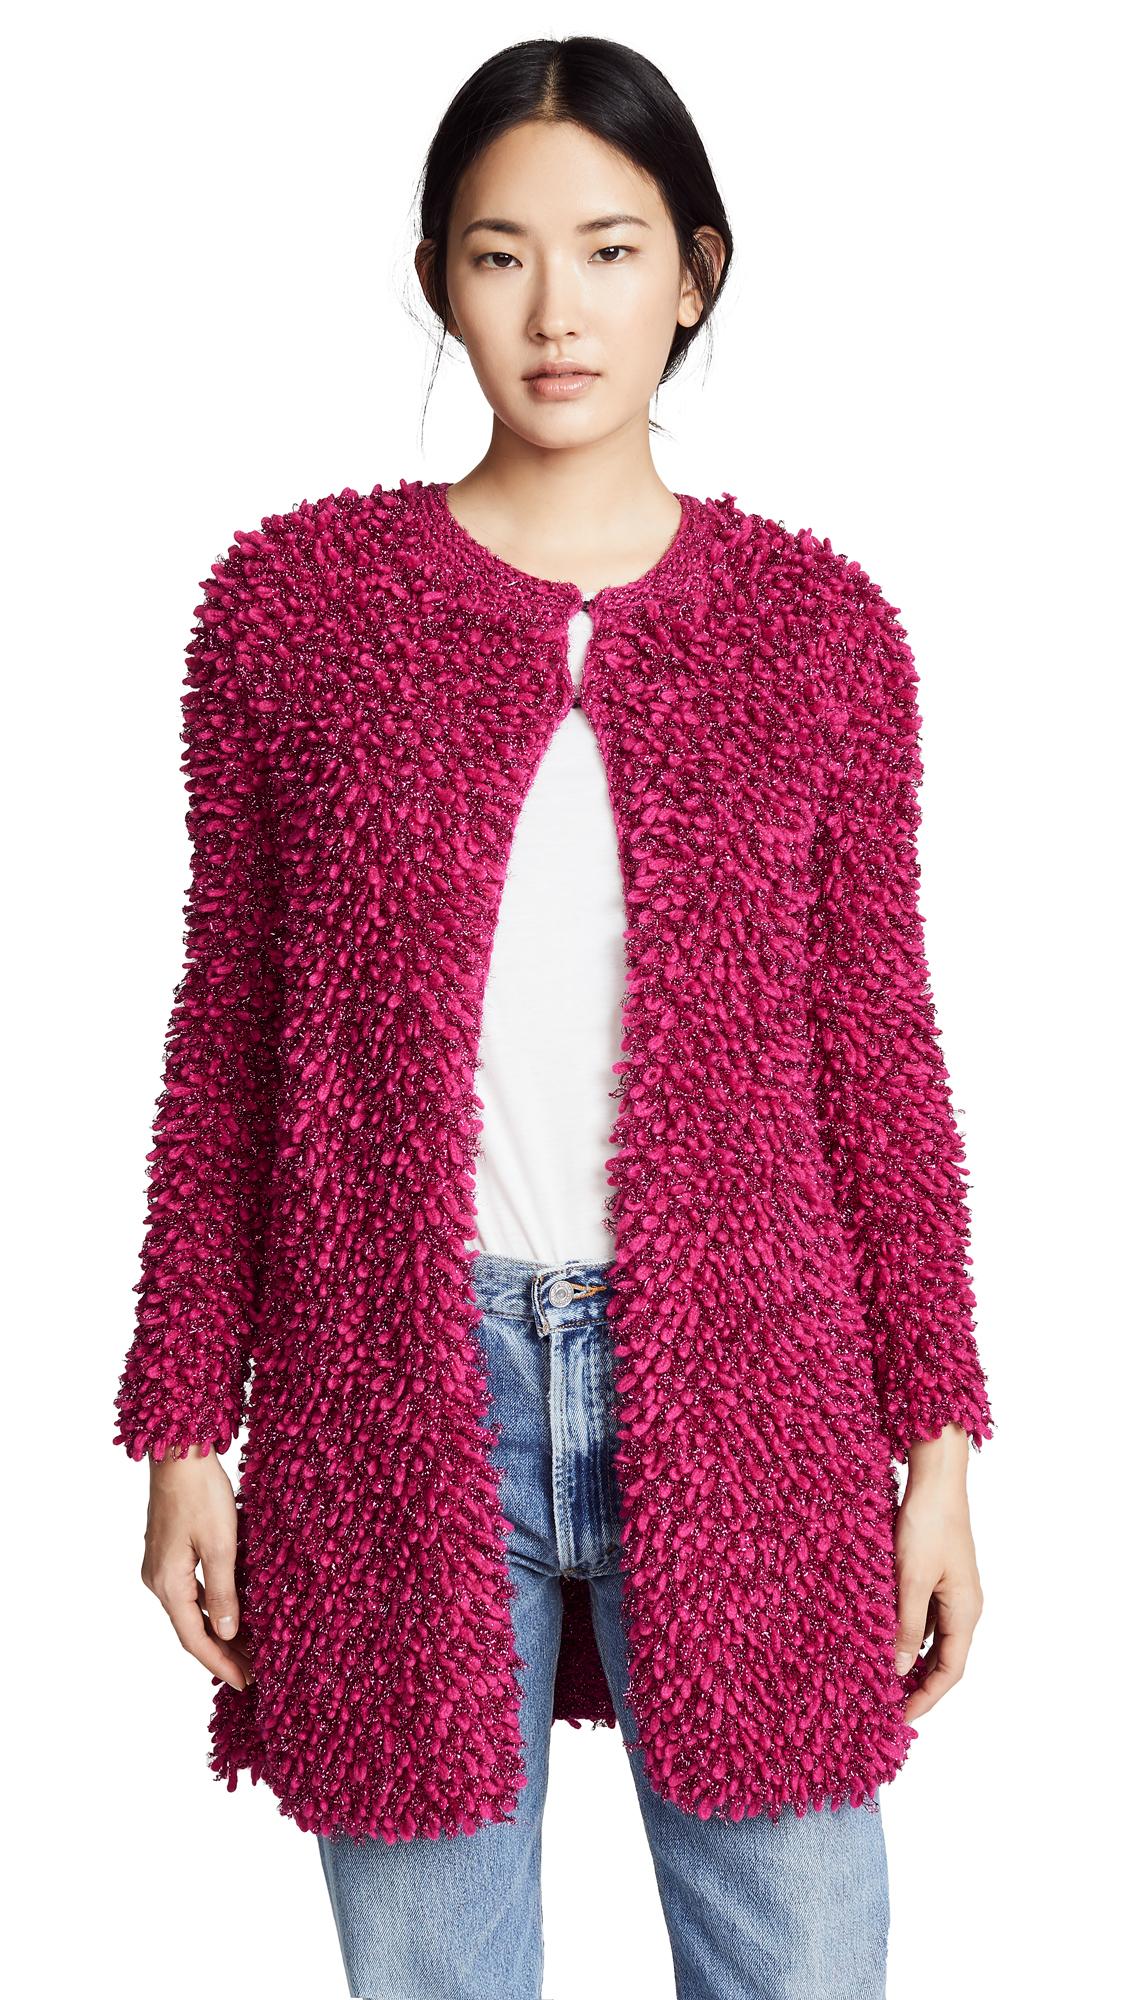 SPENCER VLADIMIR Loopy Cardigan in Pink Metallic